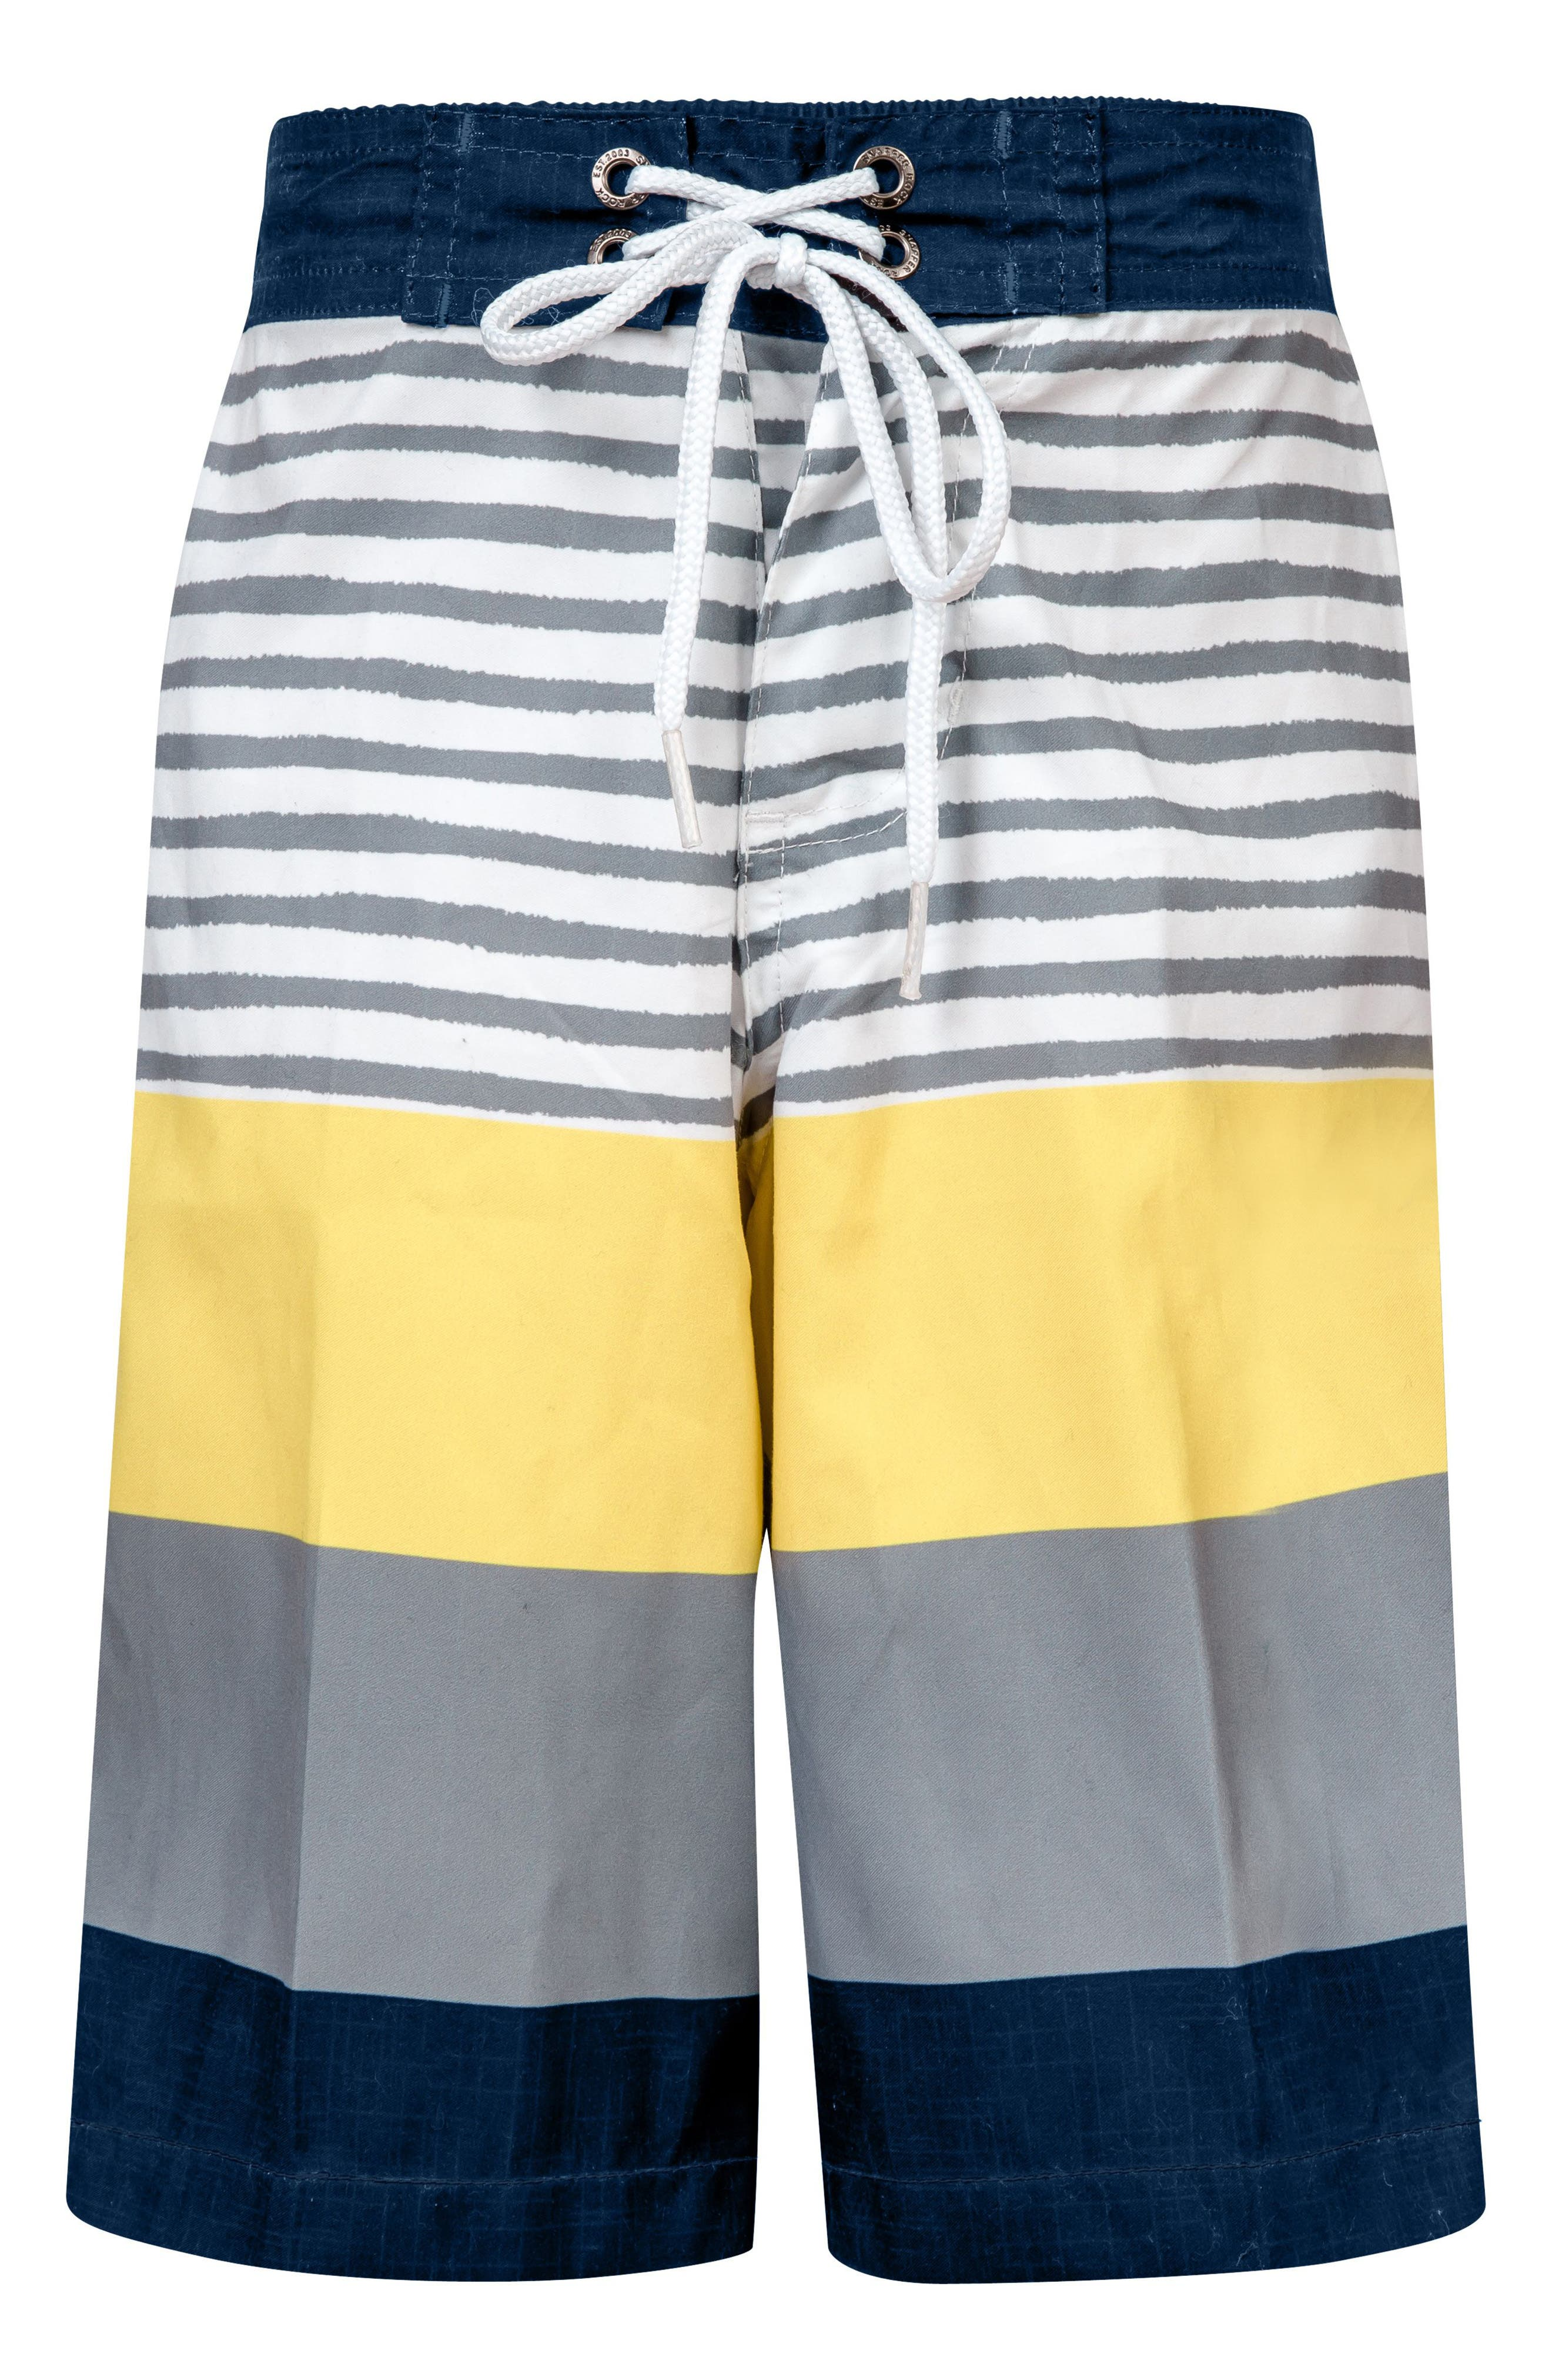 Stripe Board Shorts,                             Main thumbnail 1, color,                             Navy/ Yellow/ White